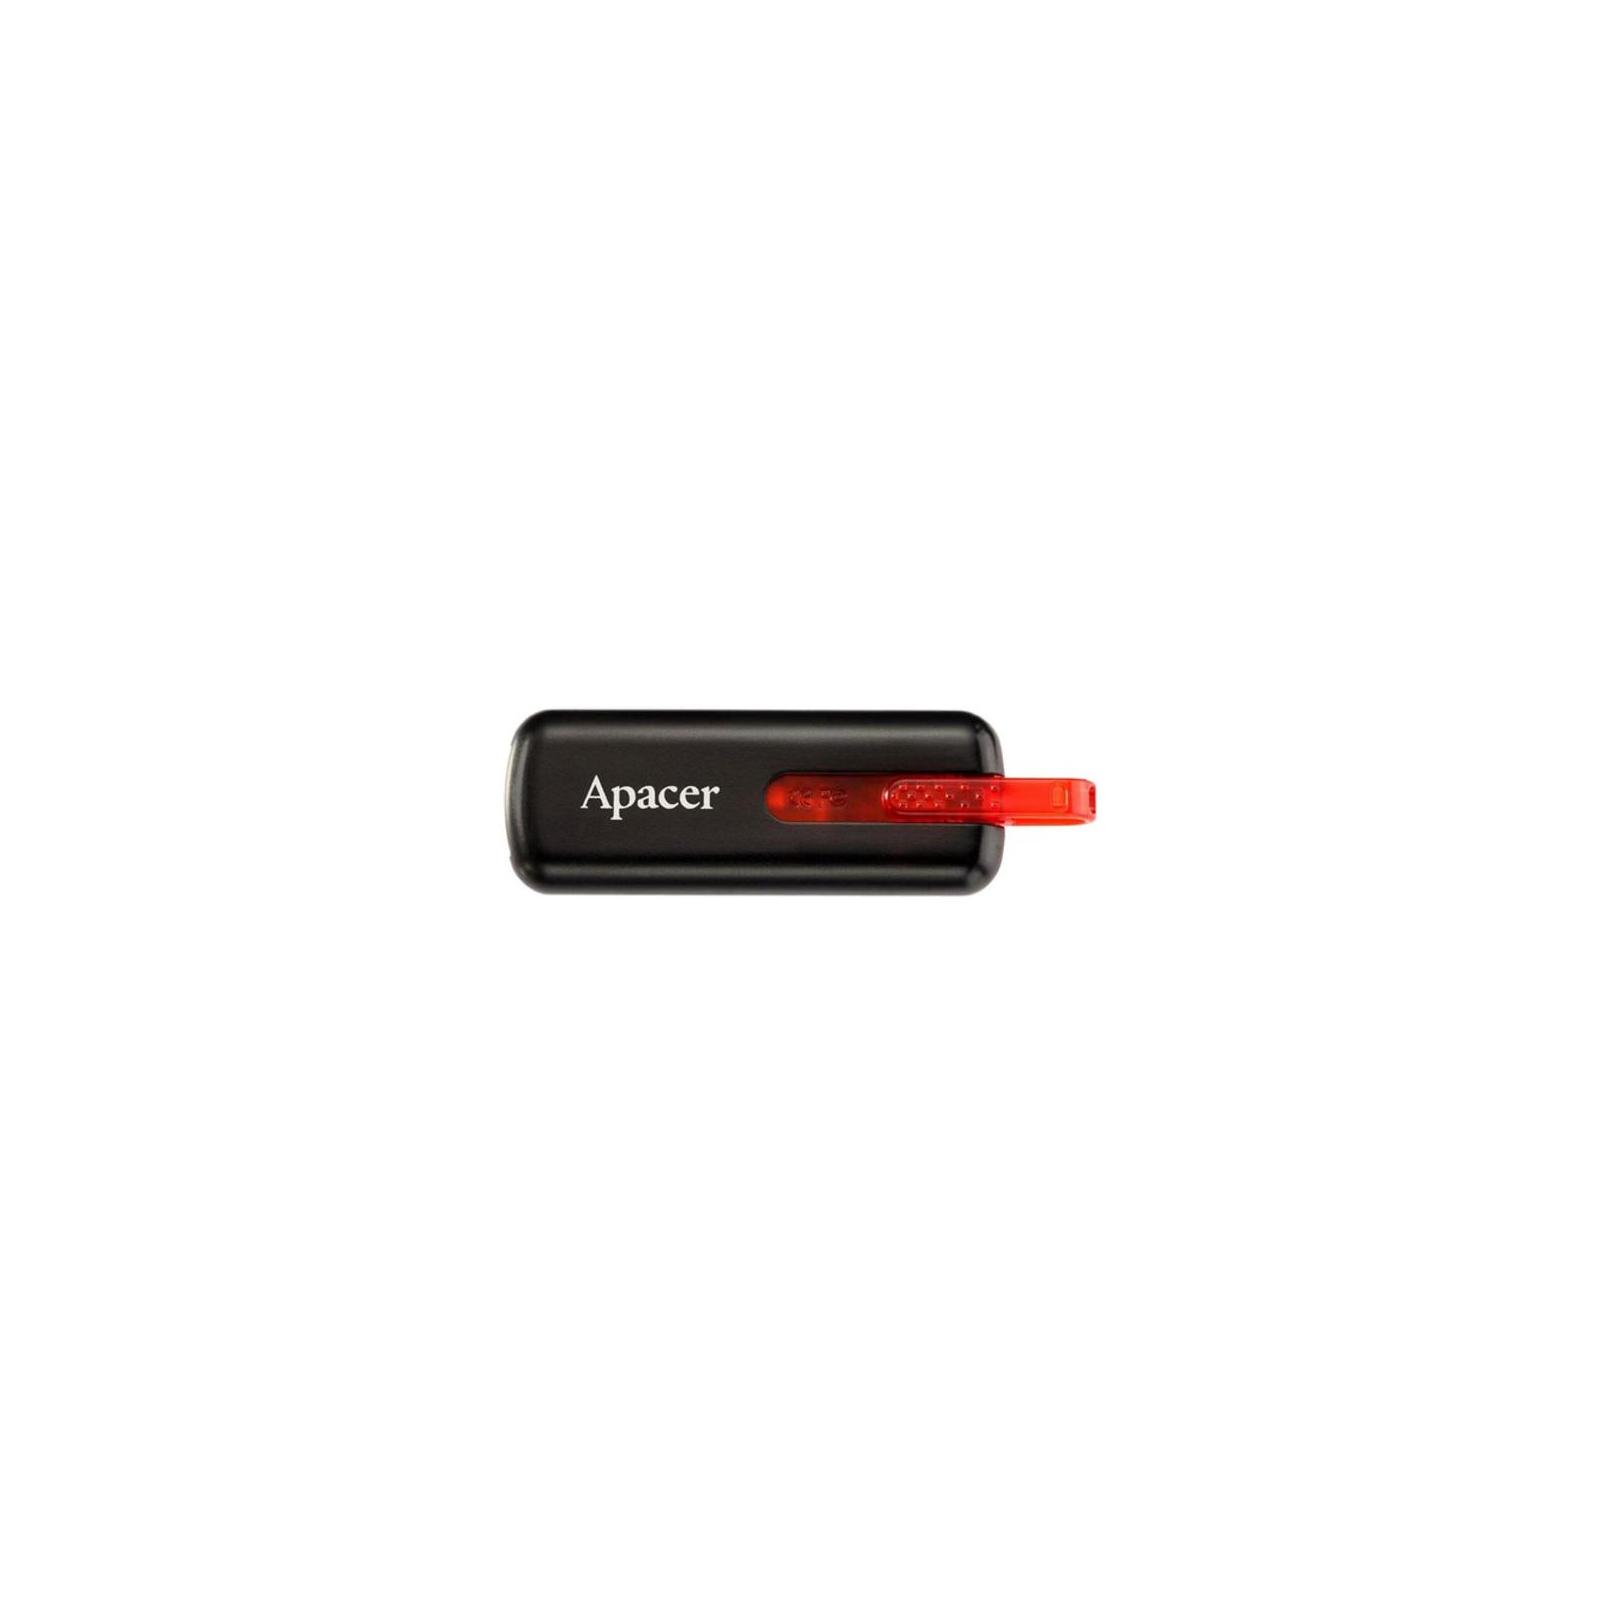 USB флеш накопитель 64GB AH326 Black RP USB2.0 Apacer (AP64GAH326B-1) изображение 3